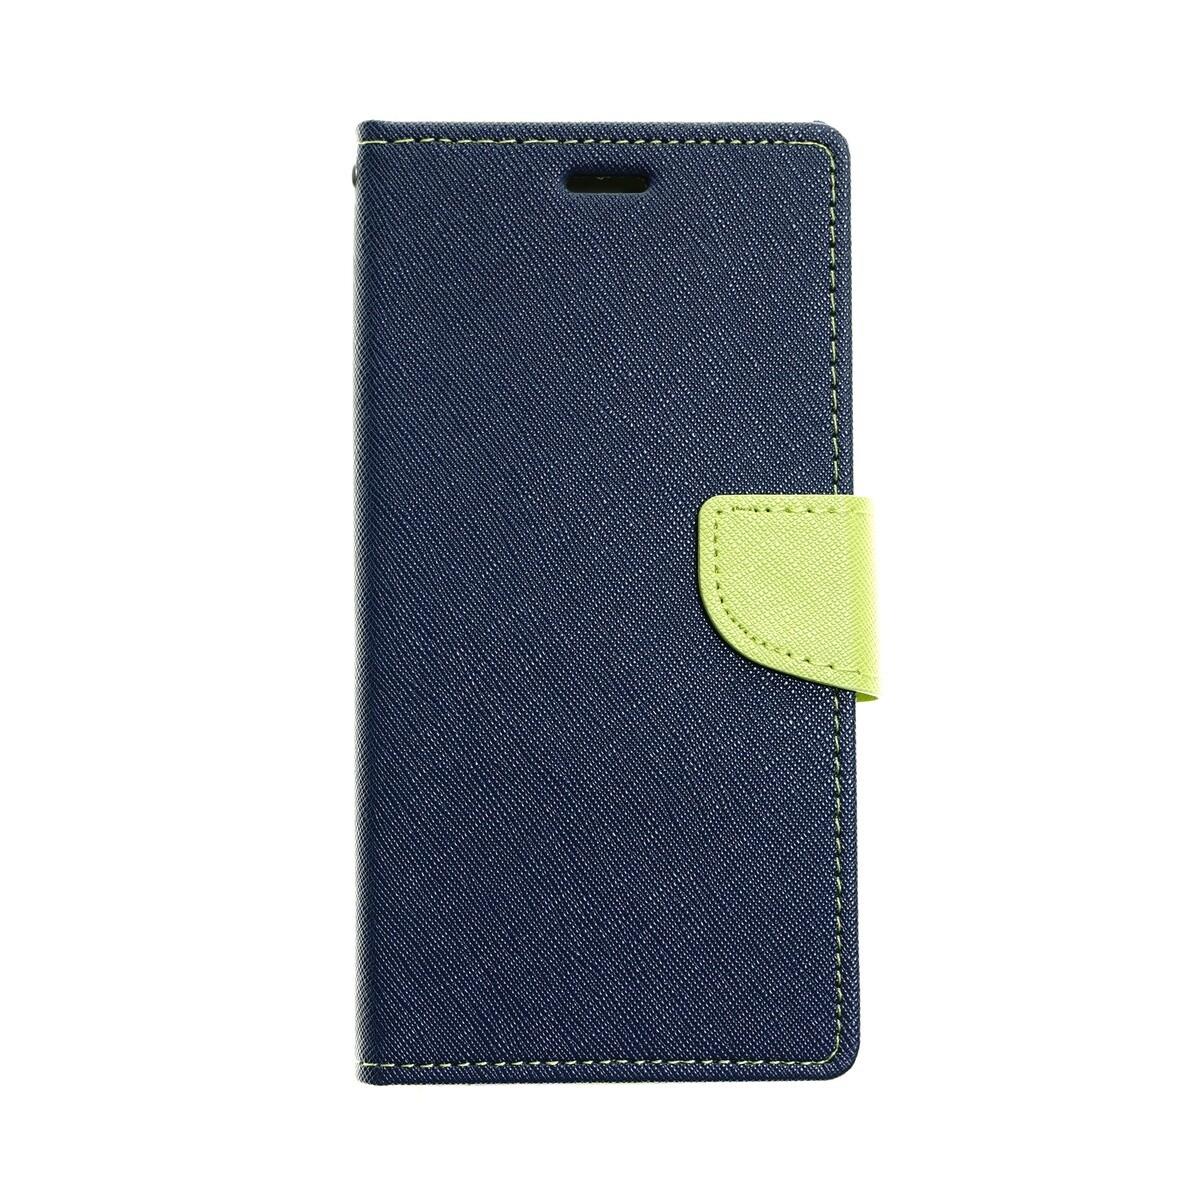 Estuche GOOSPERY Fancy Diary Azul Marino/Verde  - Iphone 6 Plus